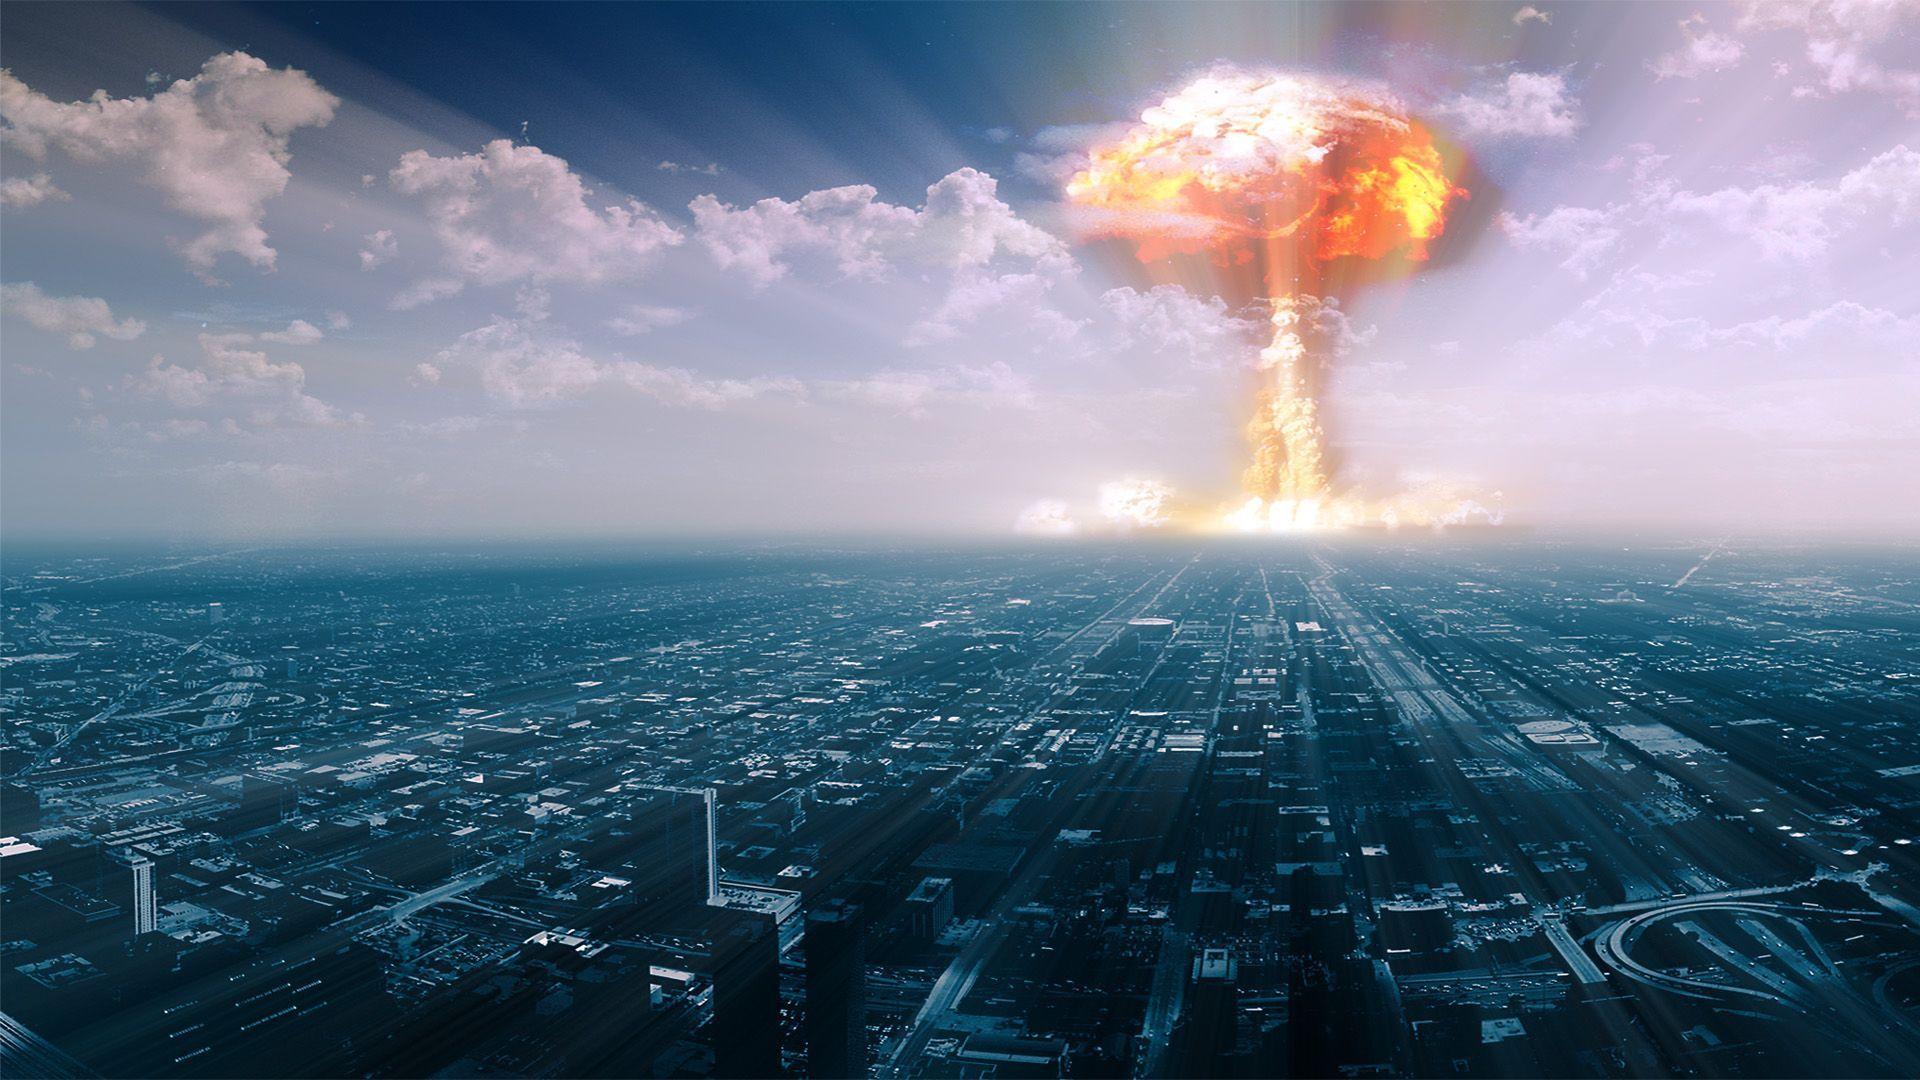 Nuclear Explosion Near The City Digital Art Hd Wallpaper 1920x1080 8368 Jpg 1920 1080 Nuclear War War Nuclear